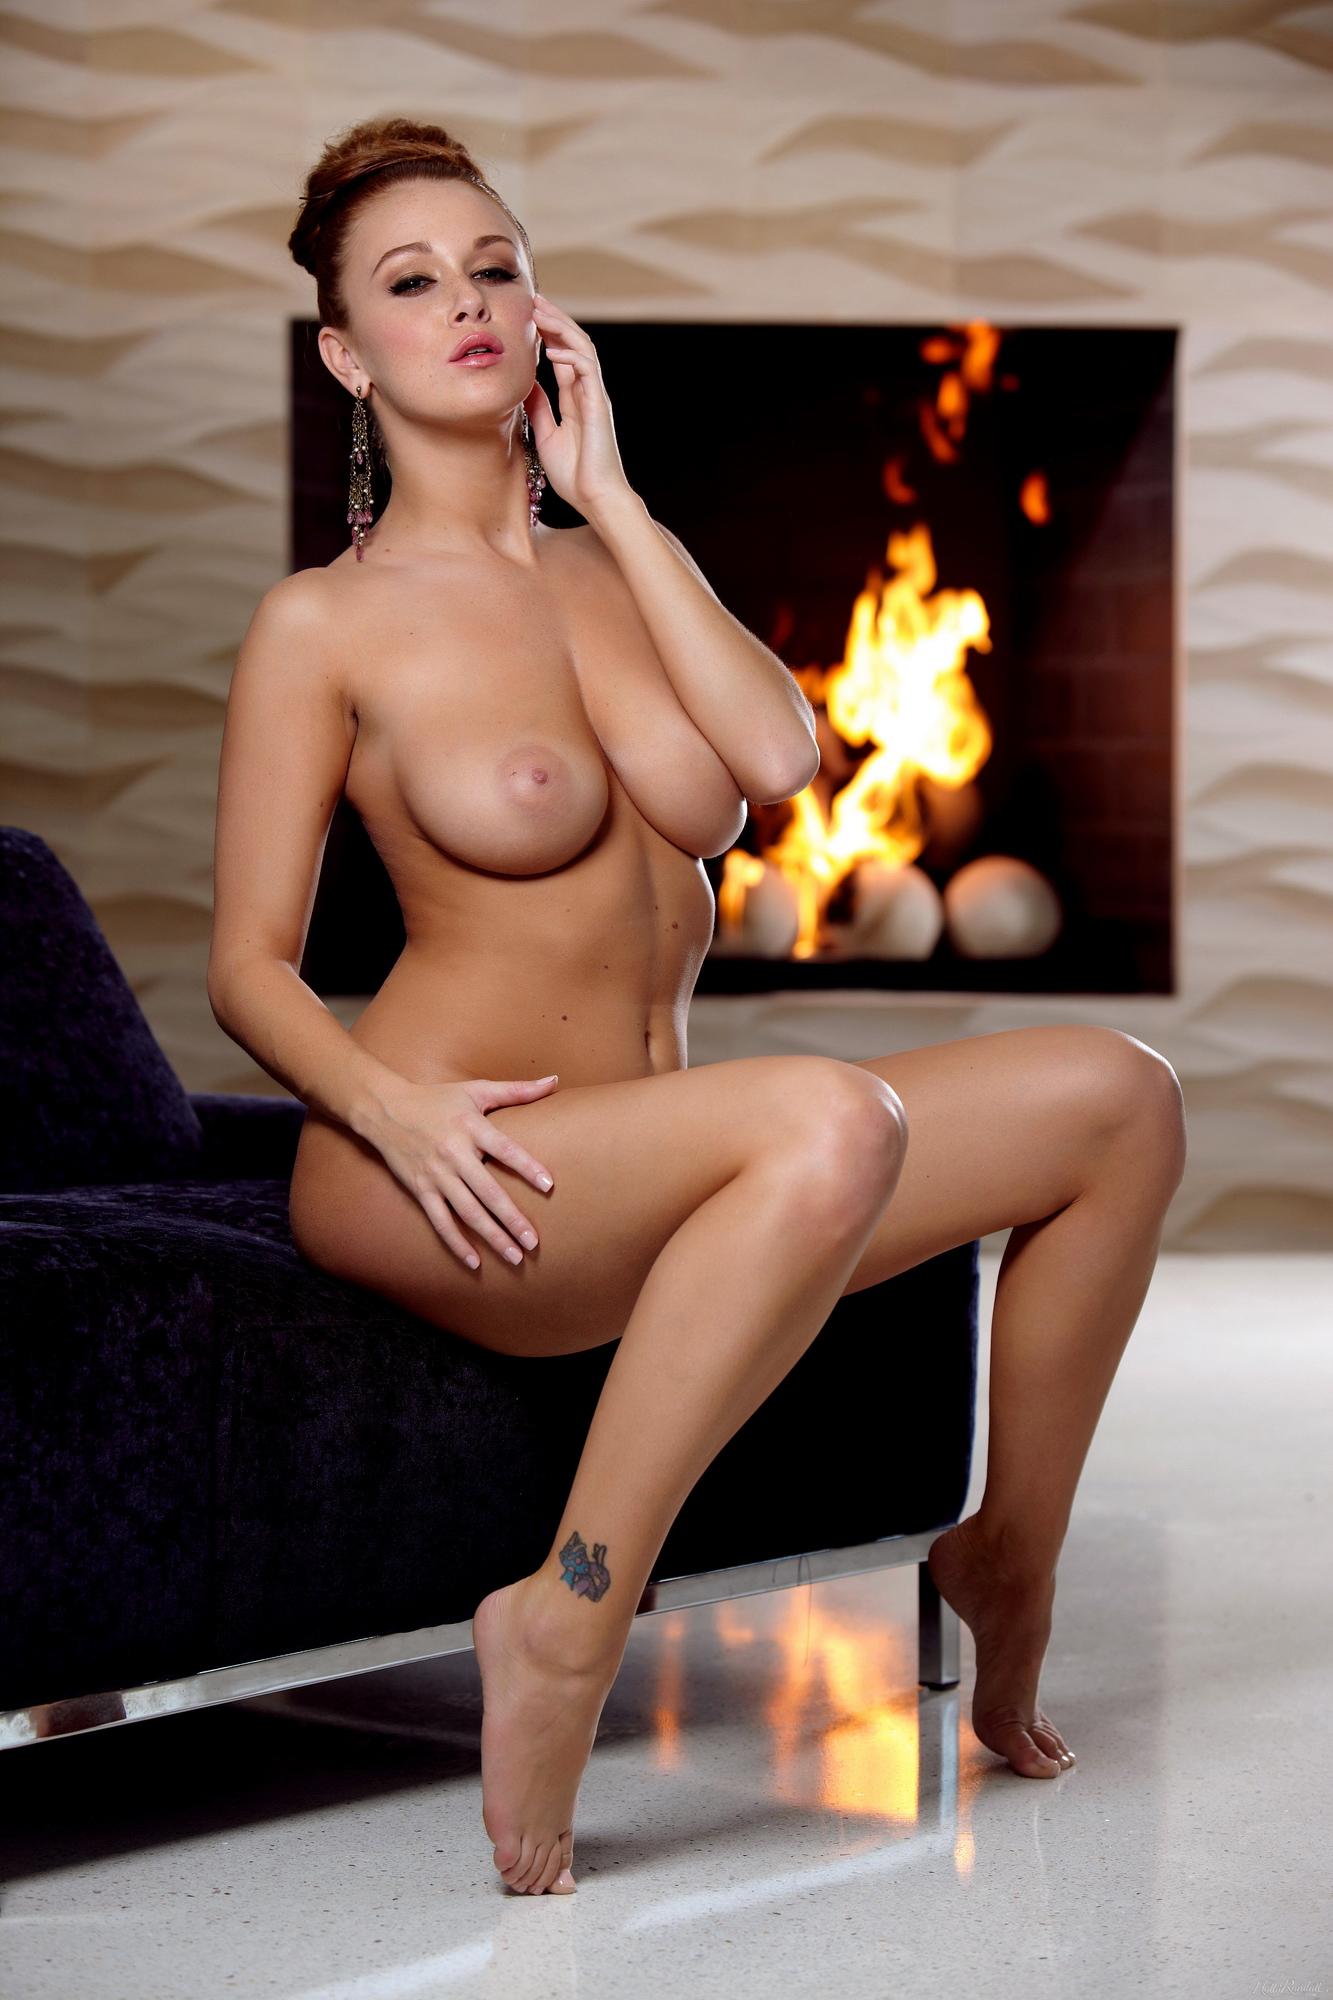 leanna-decker-nude-fireplace-redhead-hollyrandall-24